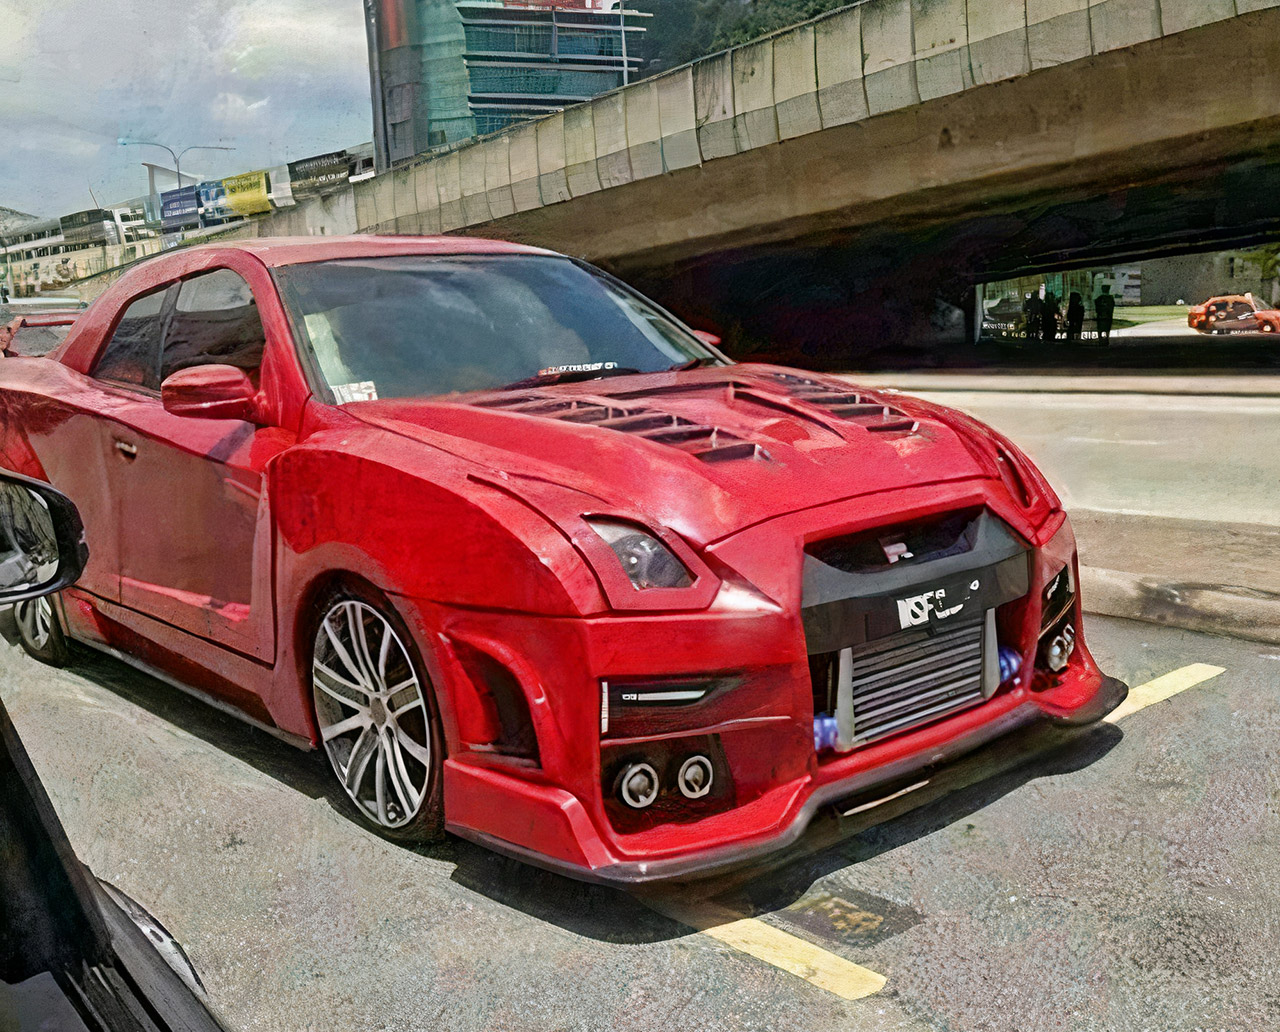 Nissan GT-R Knockoff Proton Saga Malaysia